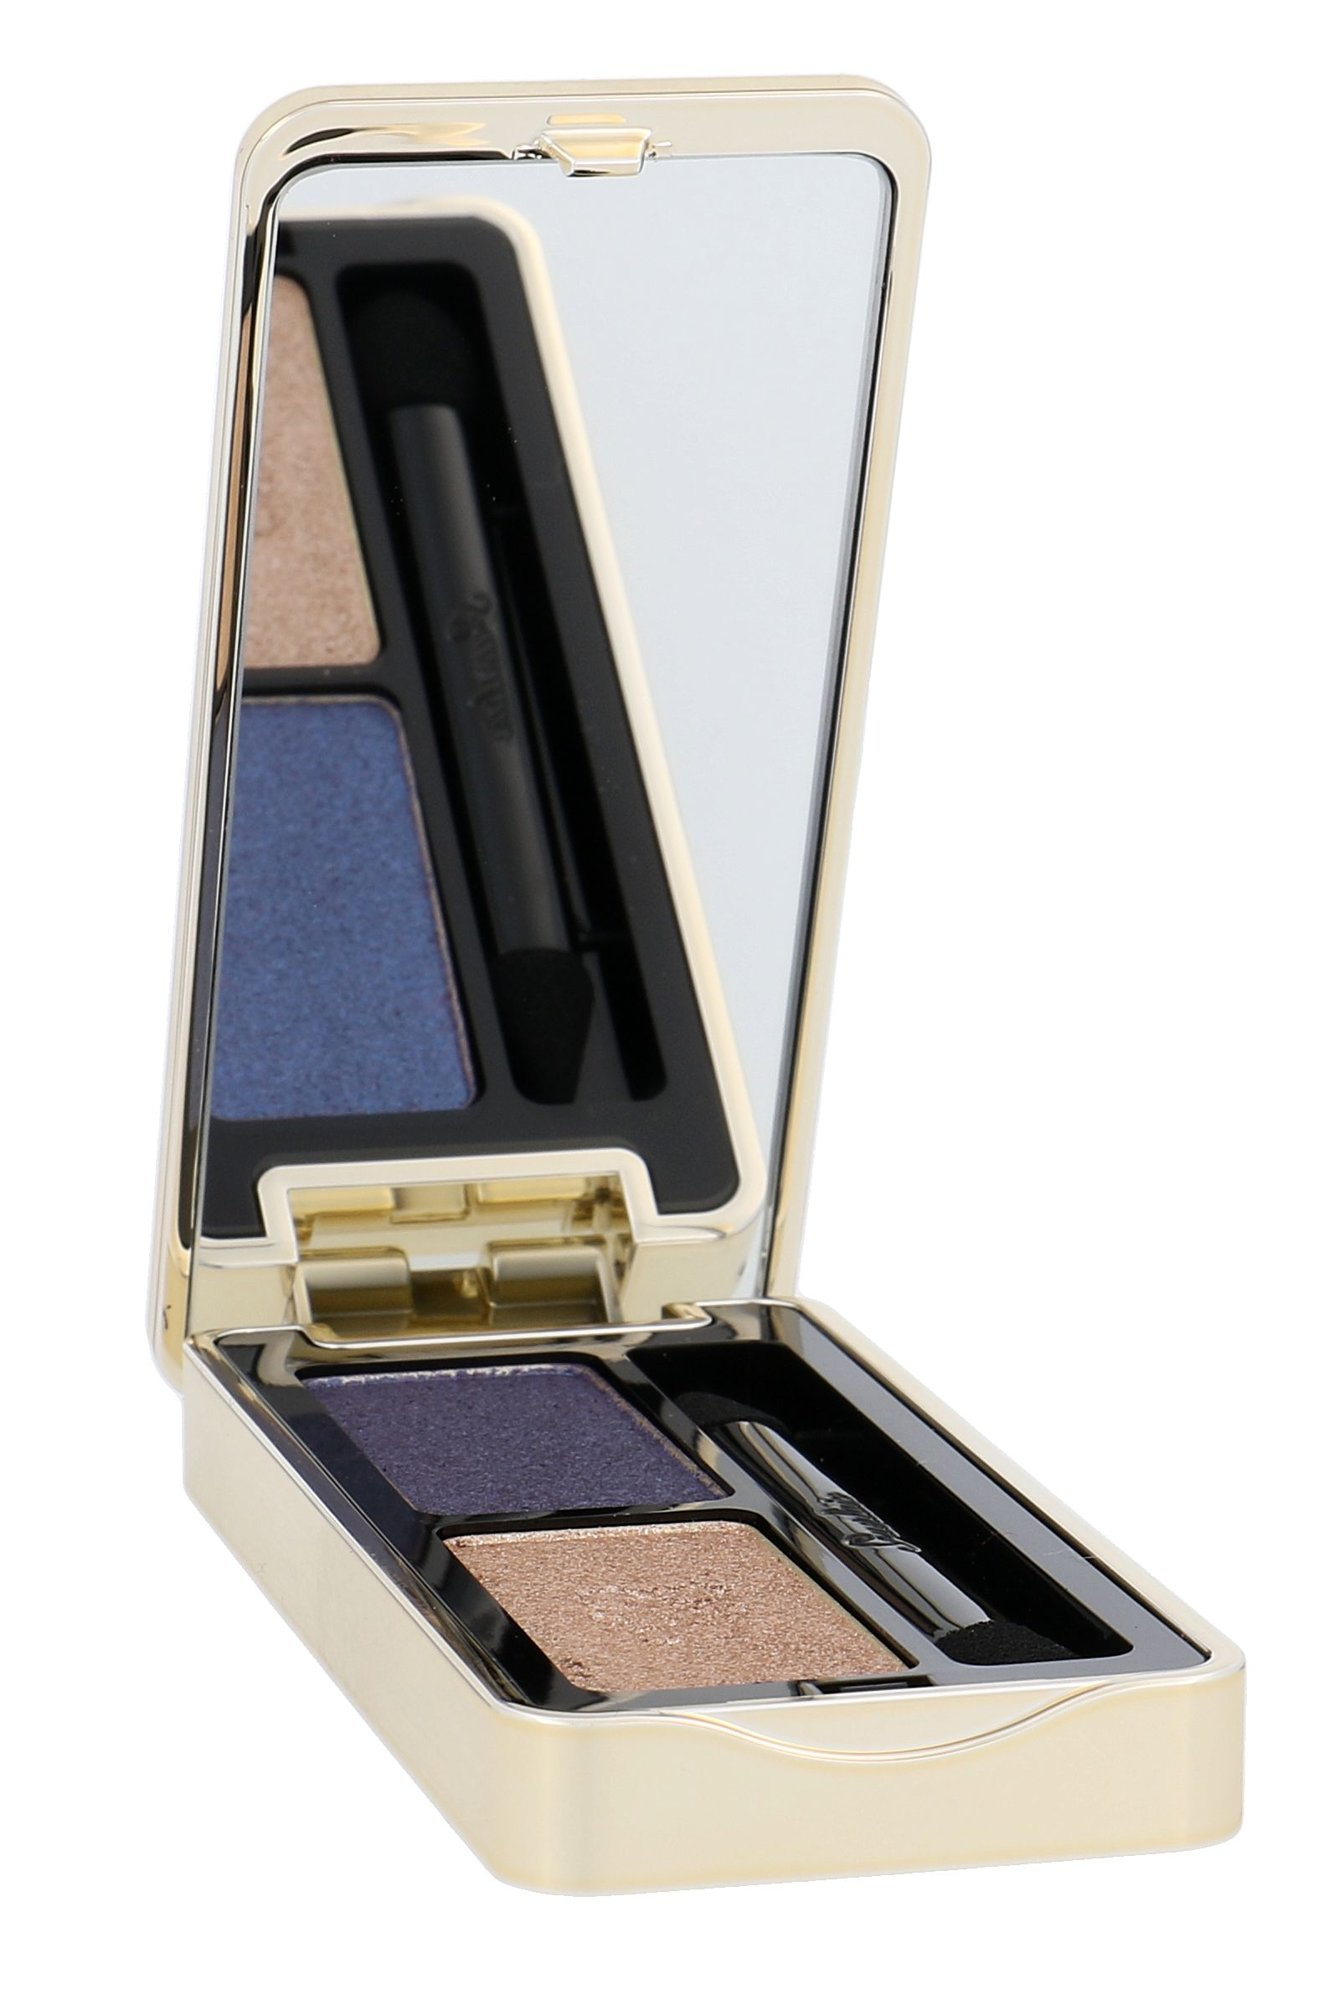 Guerlain Shalimar Eye Shadow 3ml Gold And Sapphire